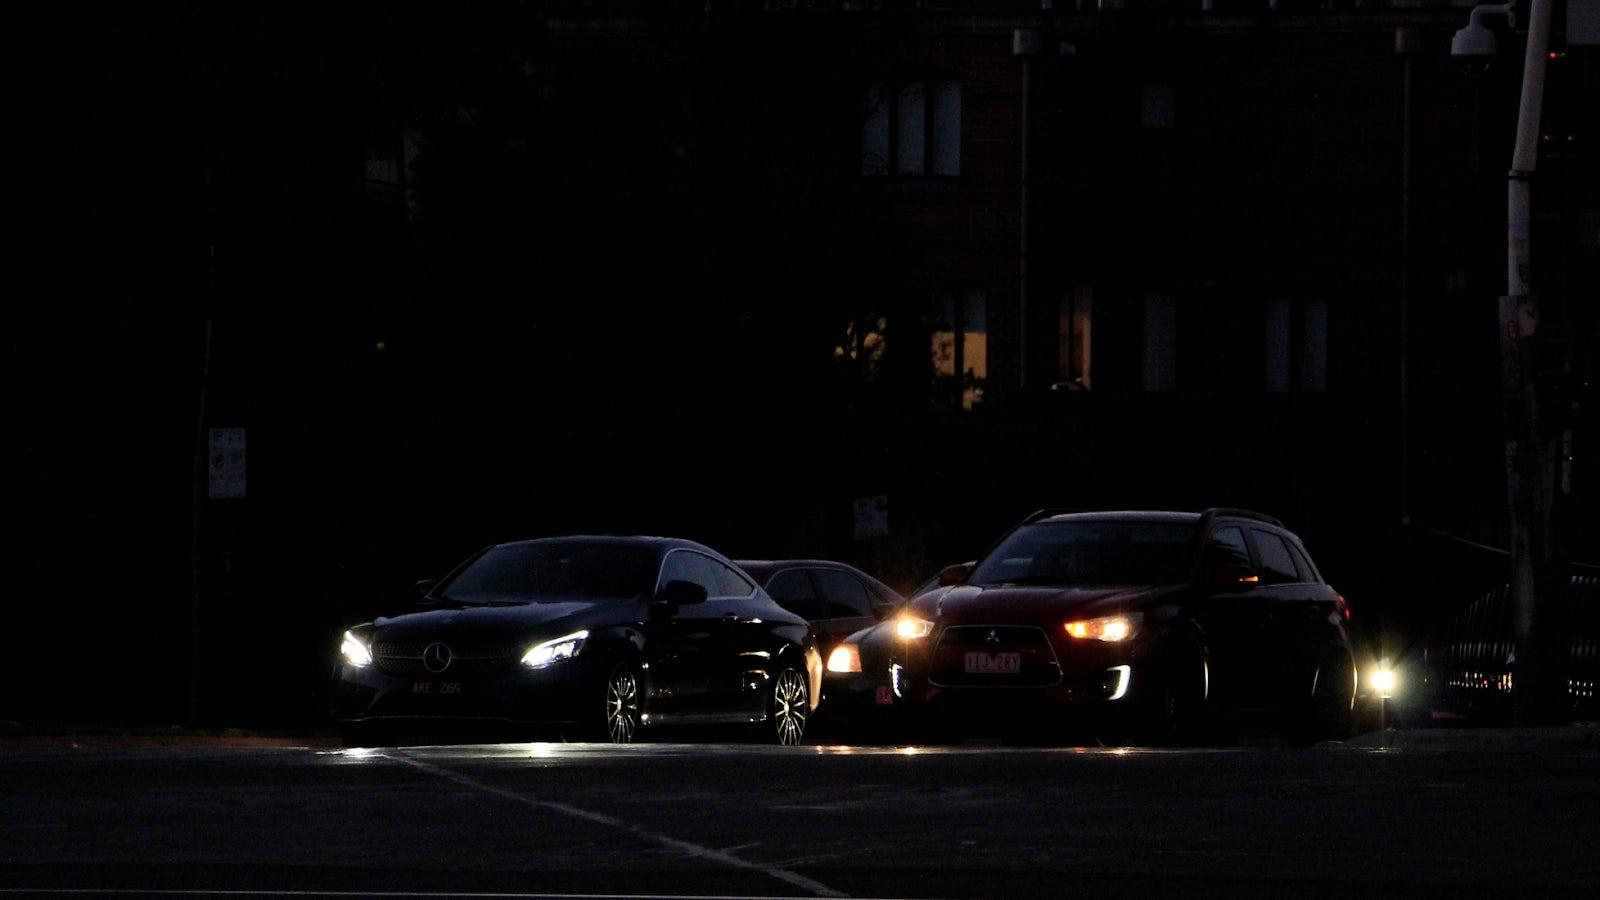 Use of car lights